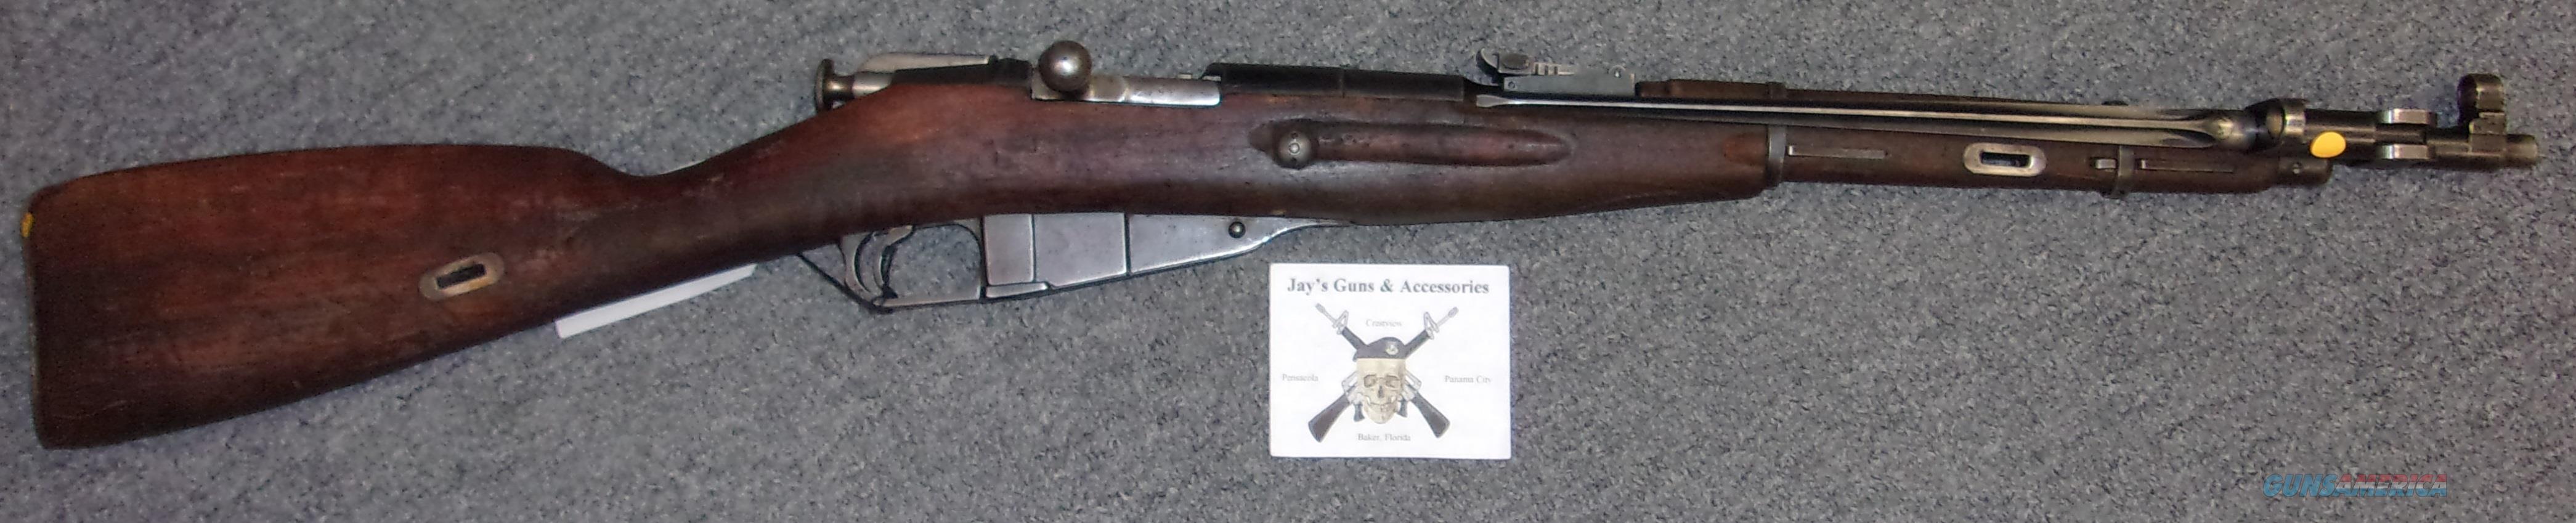 Chinese/CAI 53  Guns > Rifles > Century International Arms - Rifles > Rifles